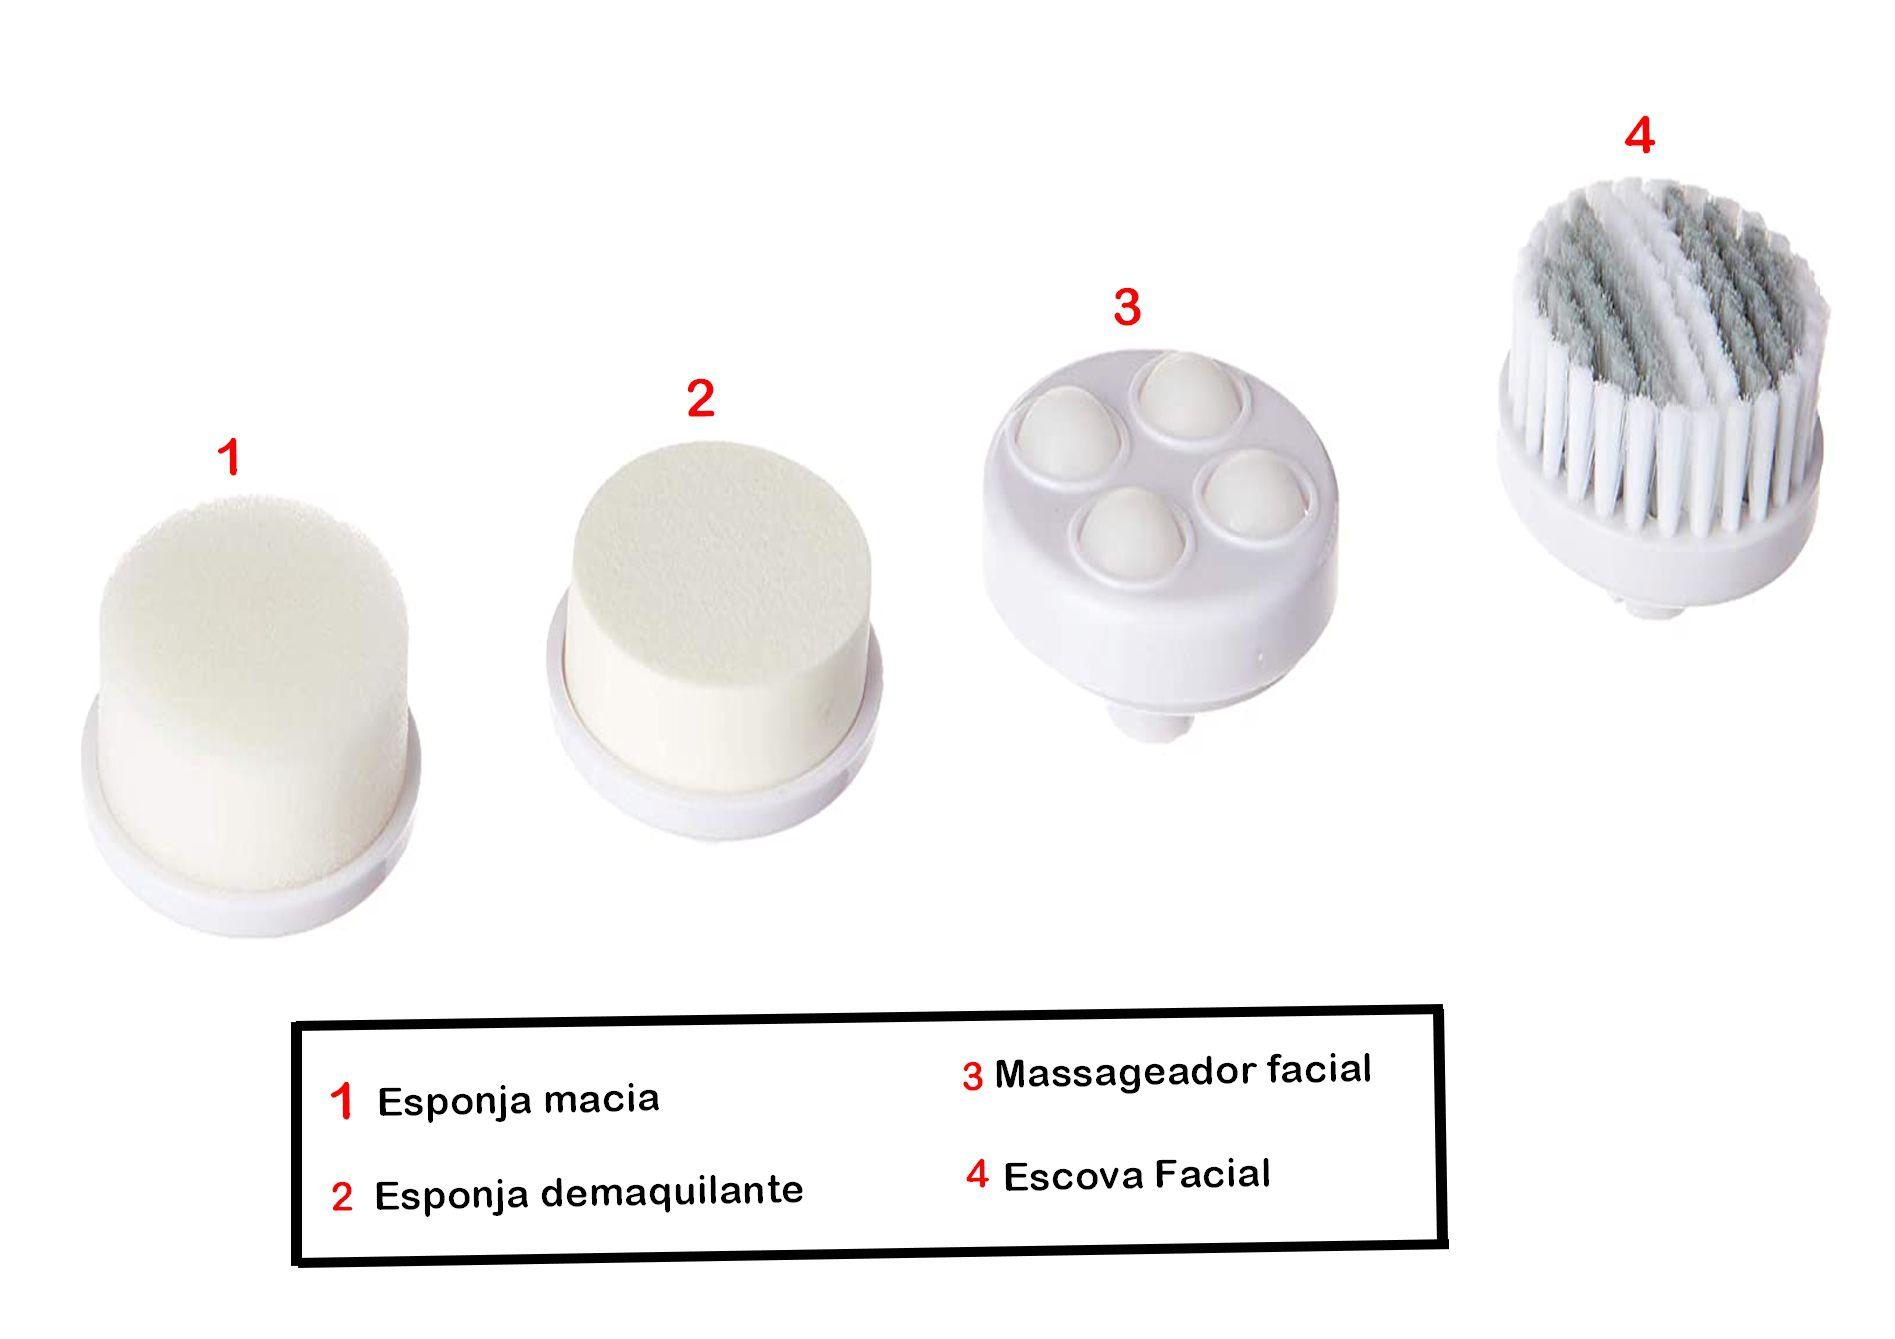 Kit Spa Escova Facial Massageador 4 em 1 Limpeza Profunda Multilaser